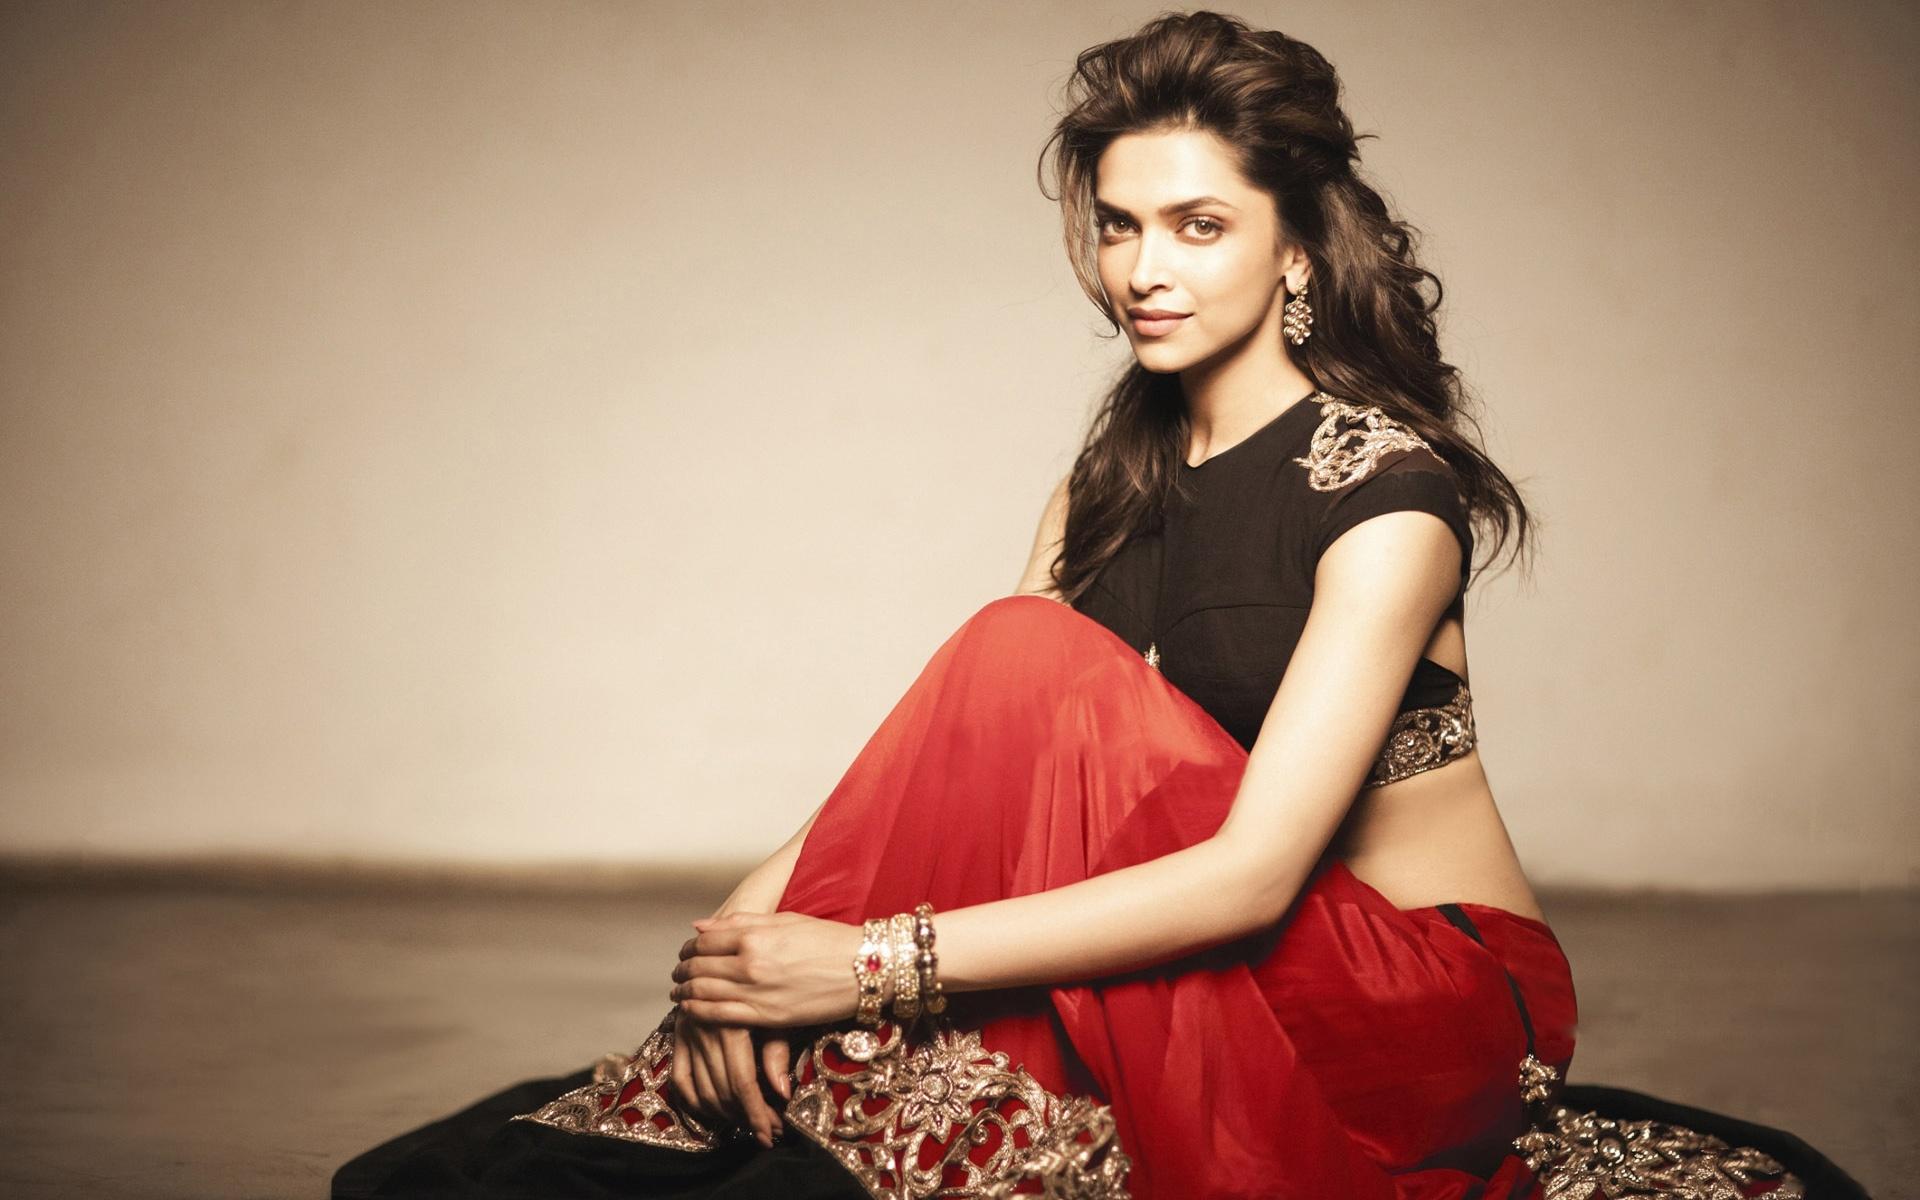 Deepika Padukone wears Red Saree/Sari in HD Wallpaper - HD ...